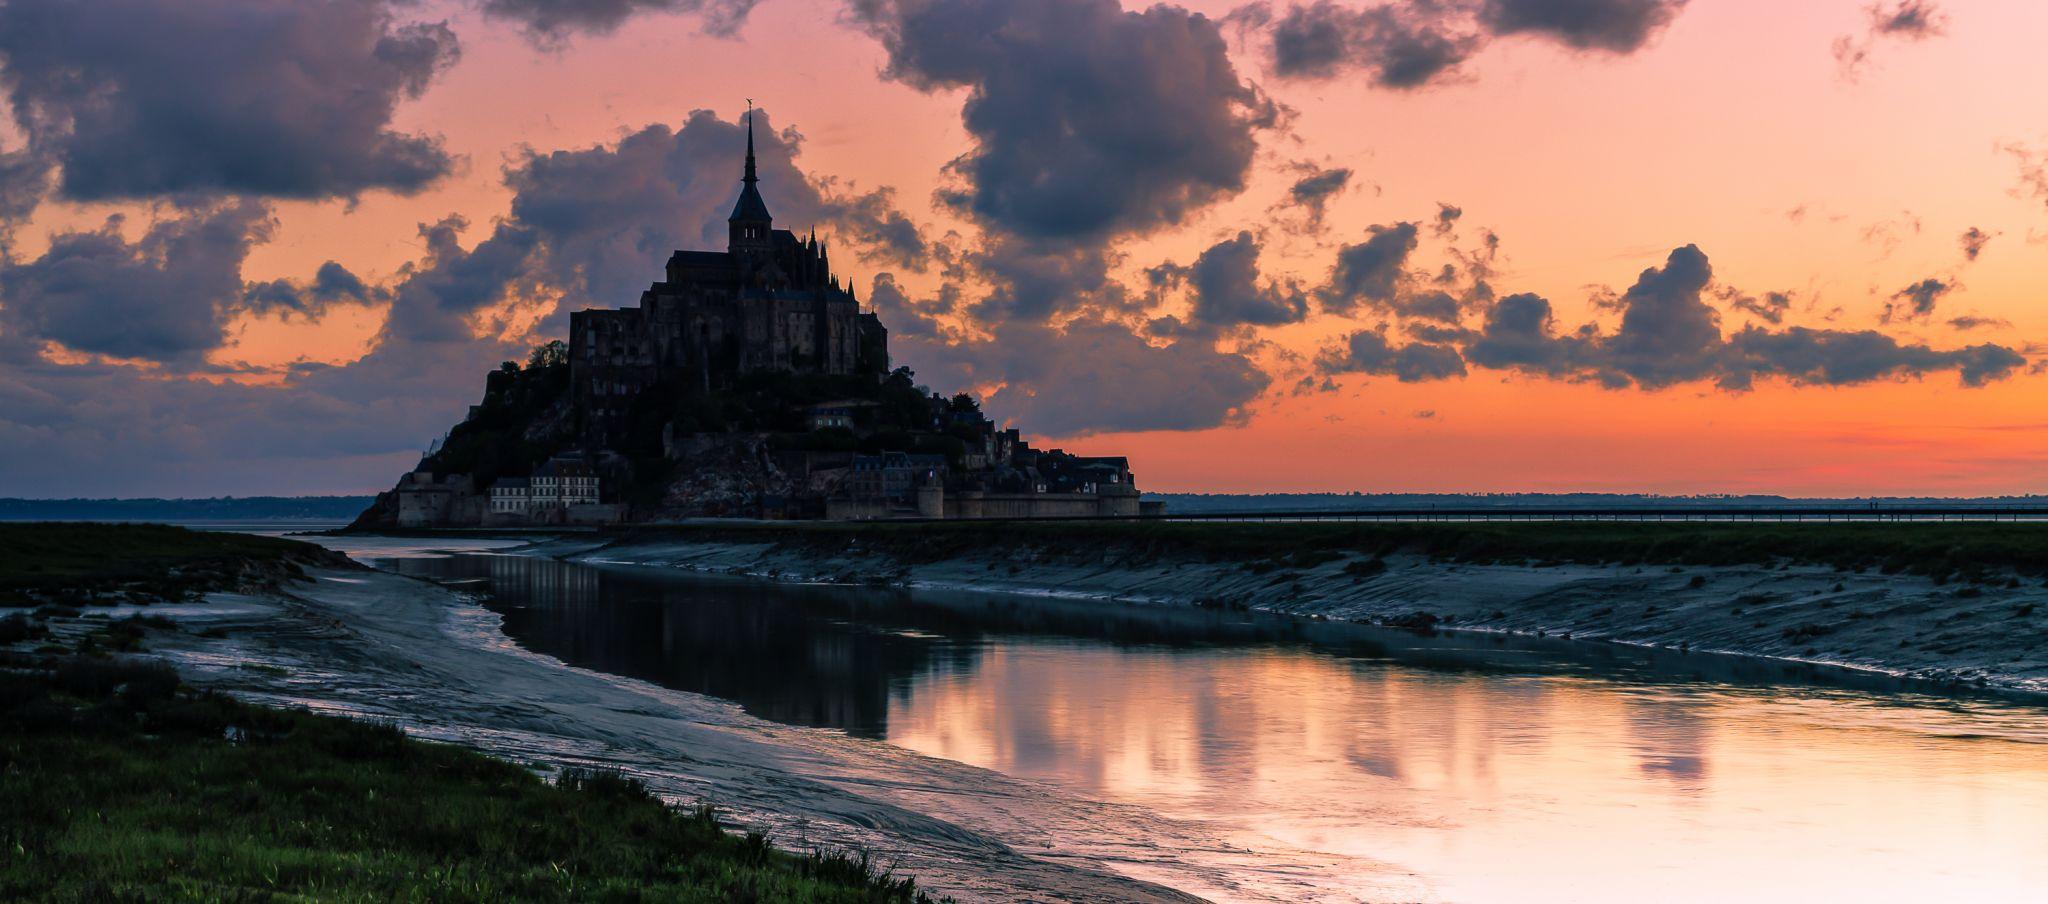 Dawn at the Mont Saint-Michel, France